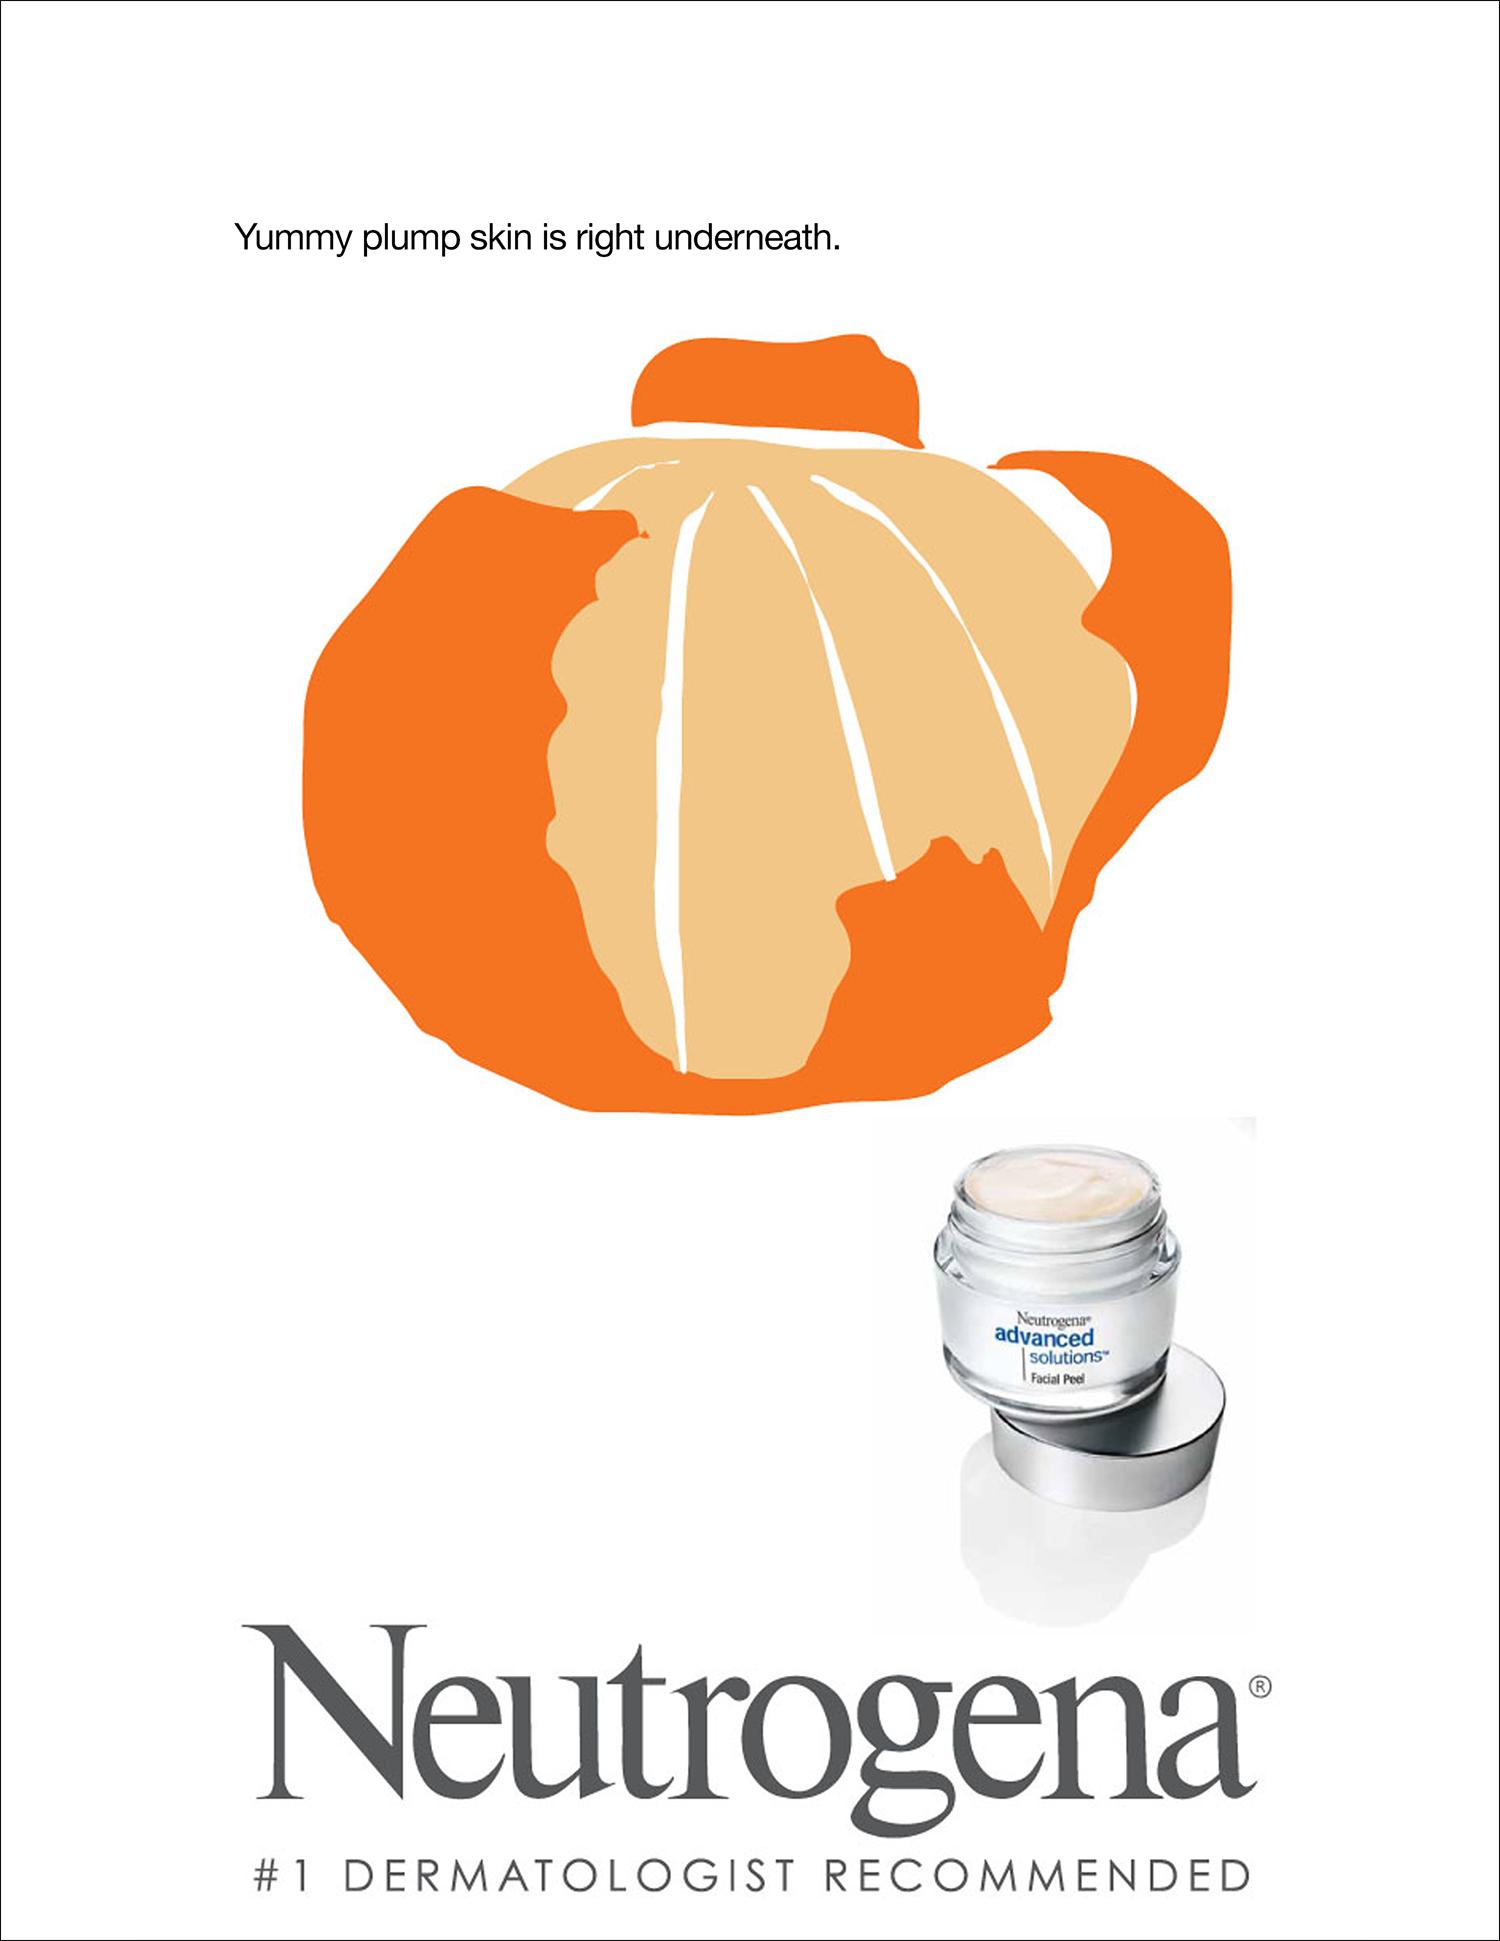 Neutrogena (Orange)